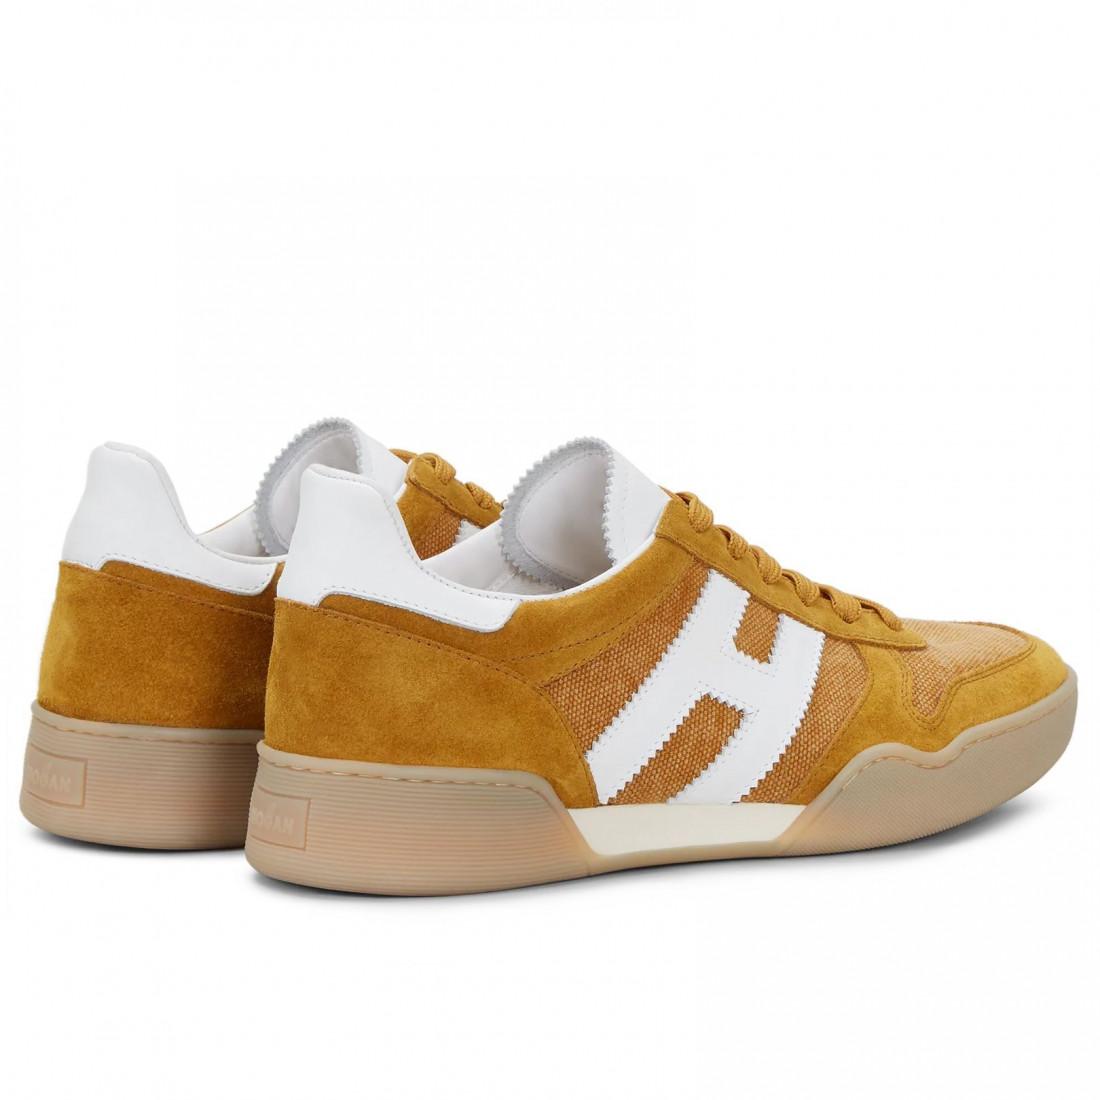 sneakers man hogan hxm3570ac40nkv05cf 6629